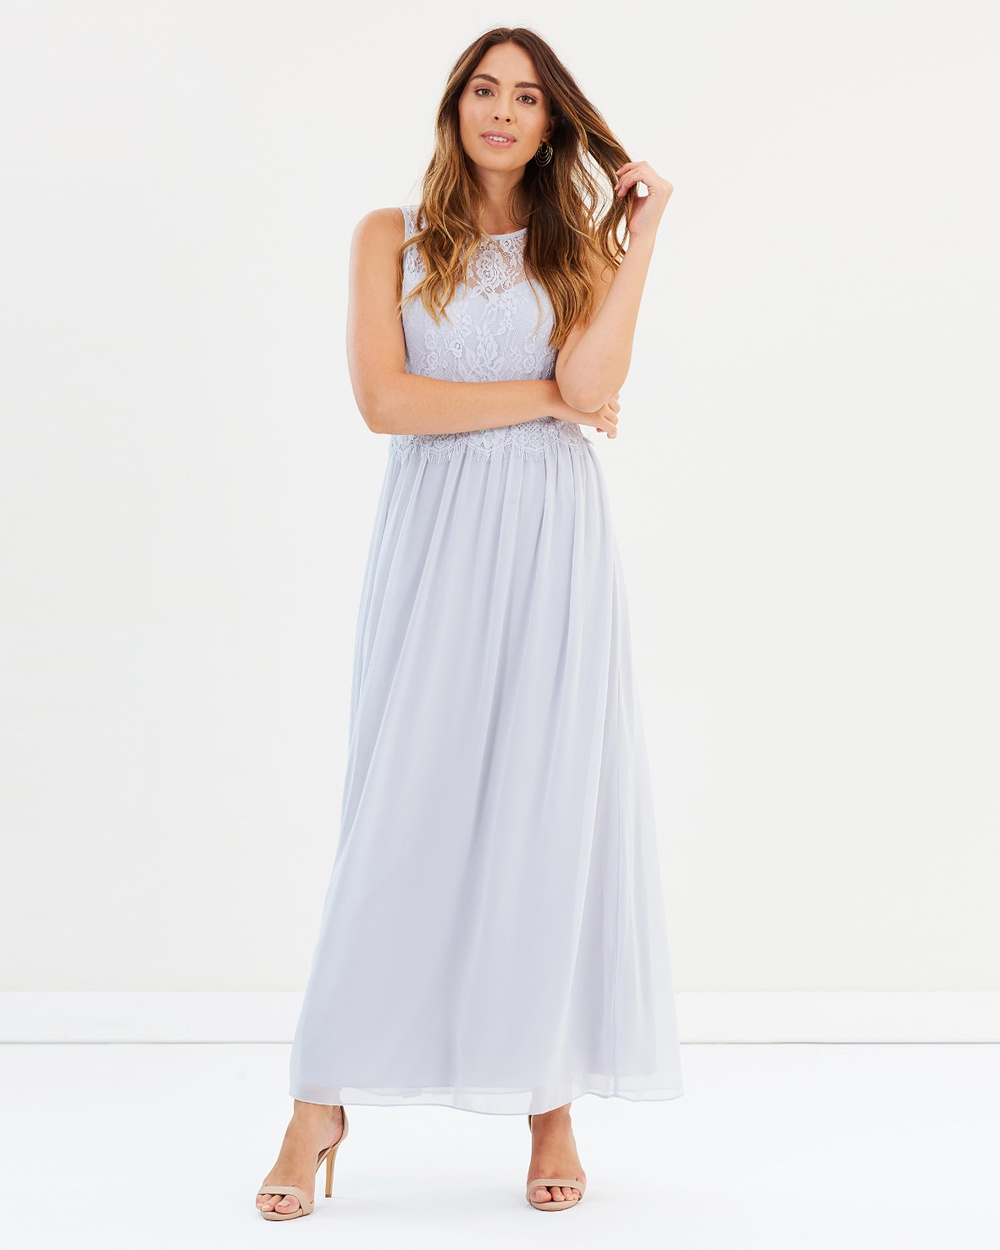 Dorothy Perkins Grace Lace Maxi Dress Bridesmaid Dresses Grey Grace Lace Maxi Dress